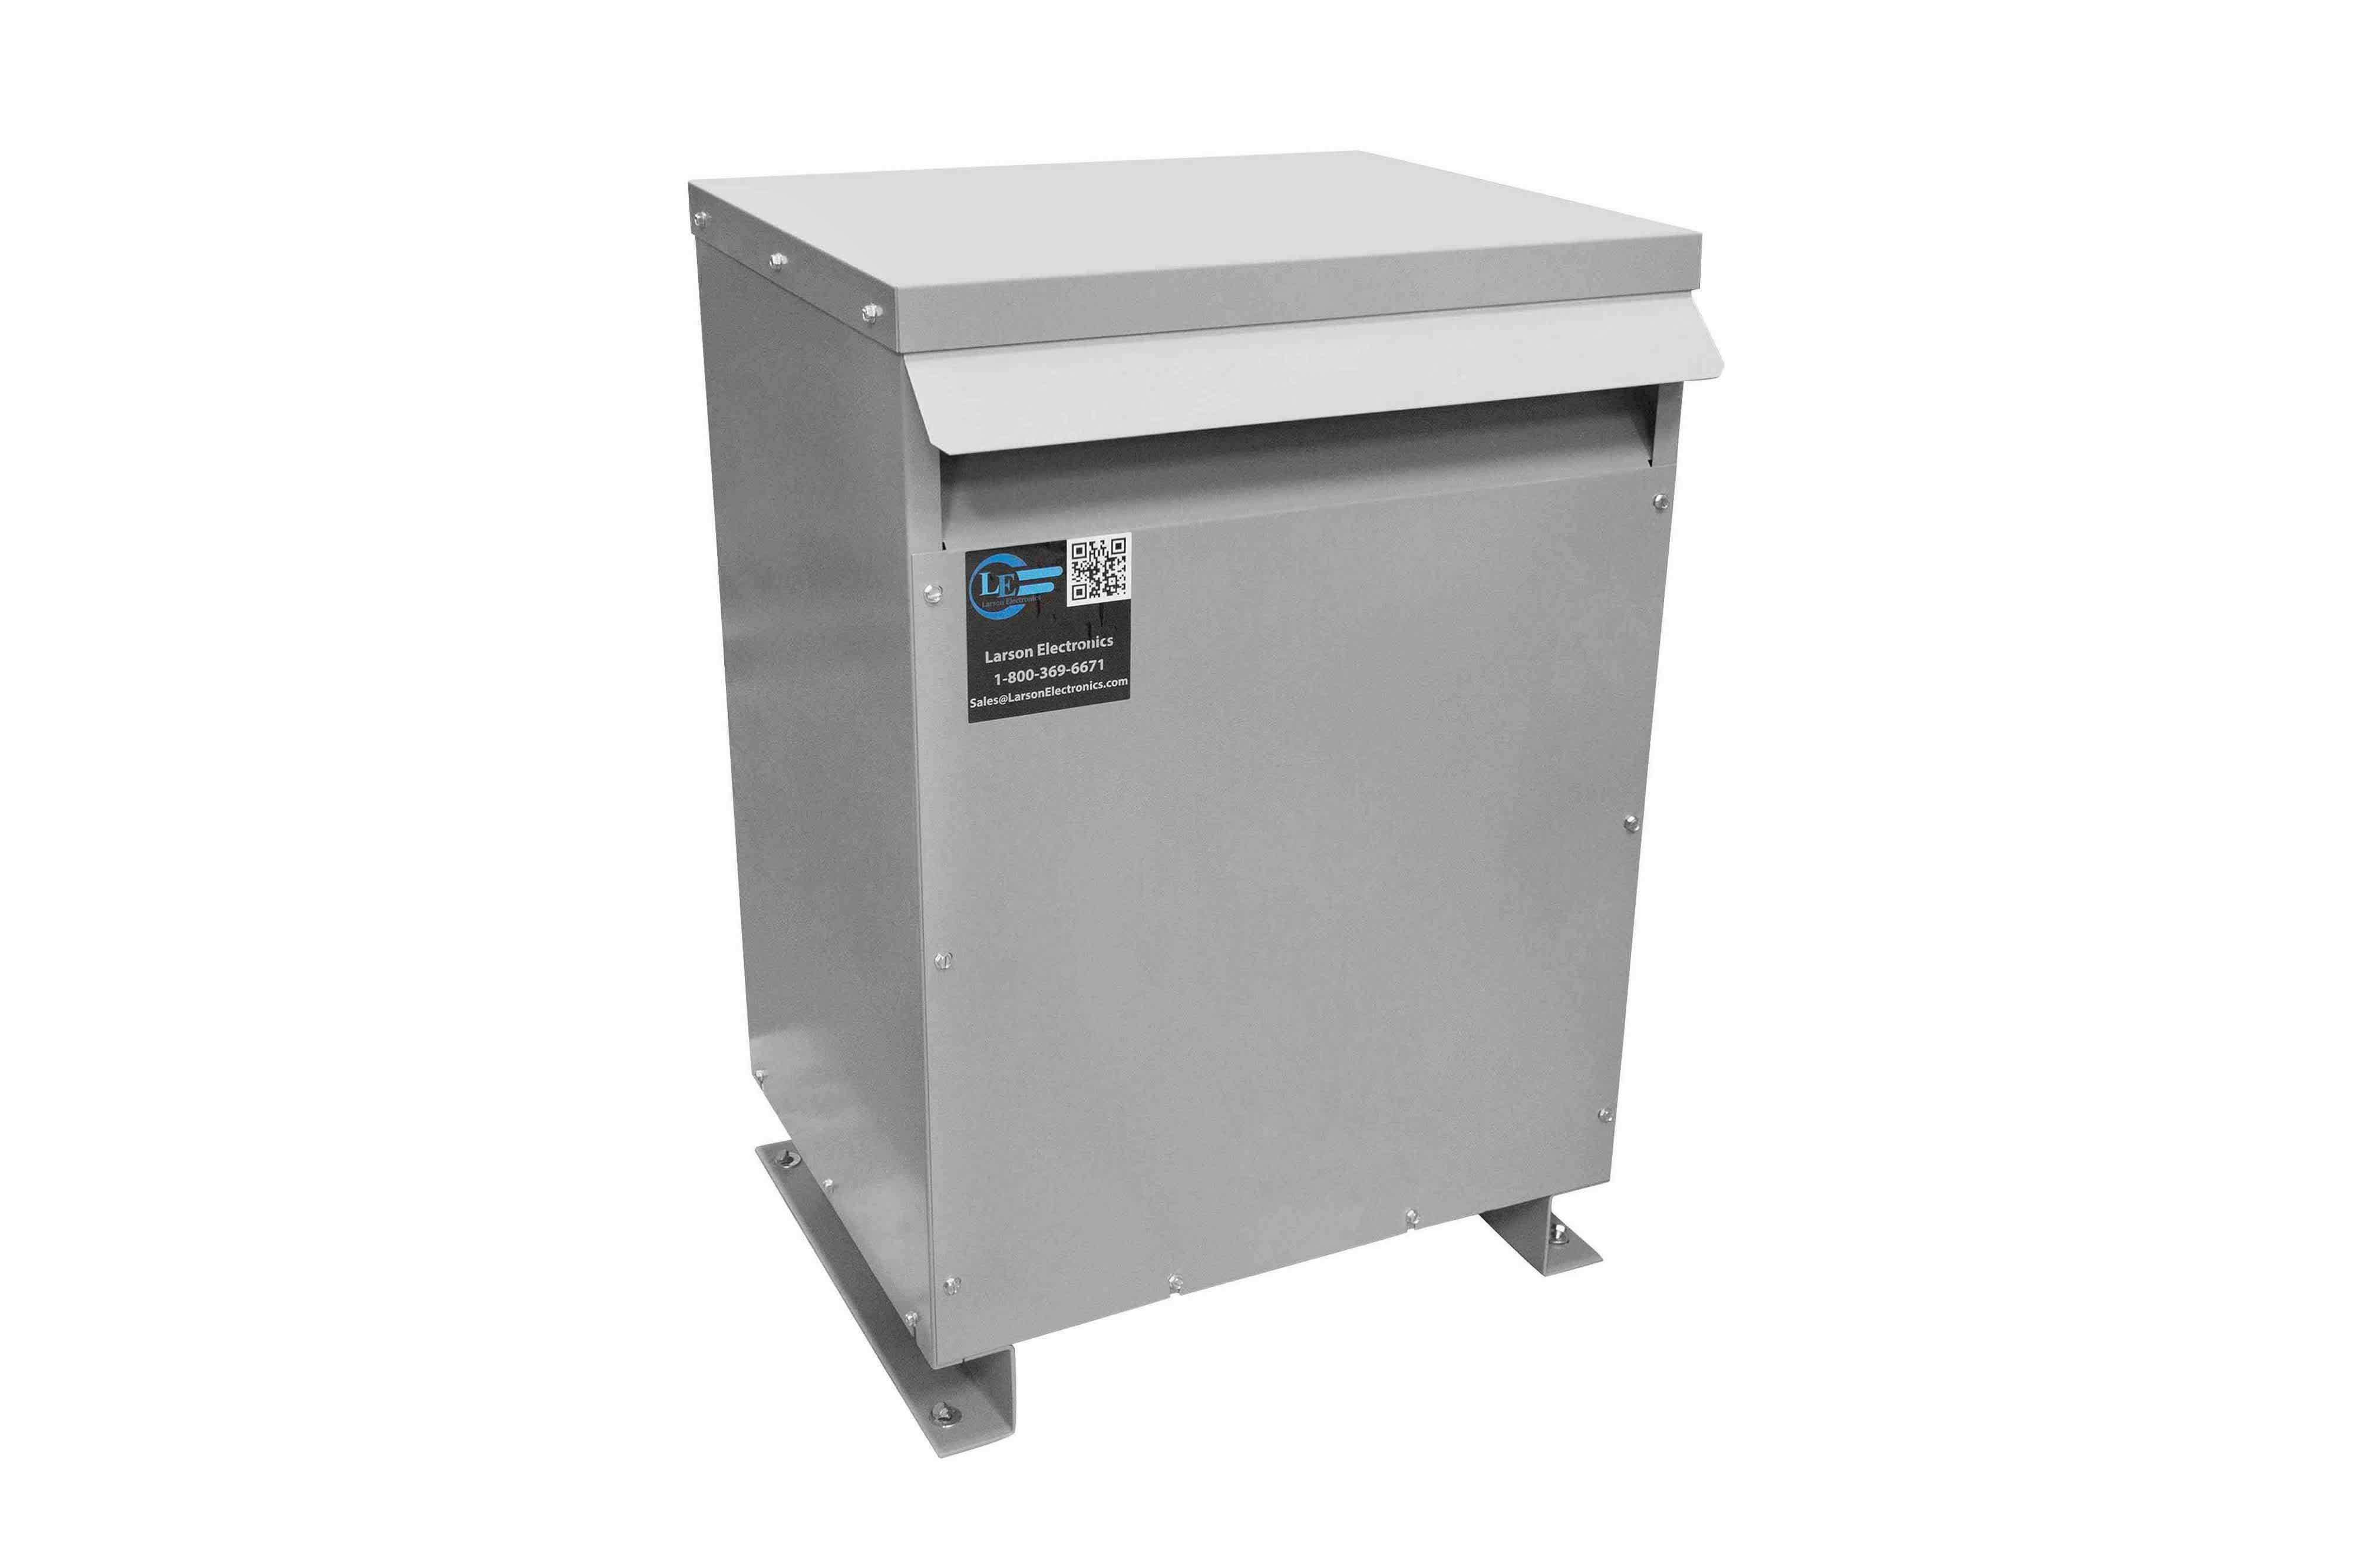 29 kVA 3PH Isolation Transformer, 208V Wye Primary, 480V Delta Secondary, N3R, Ventilated, 60 Hz